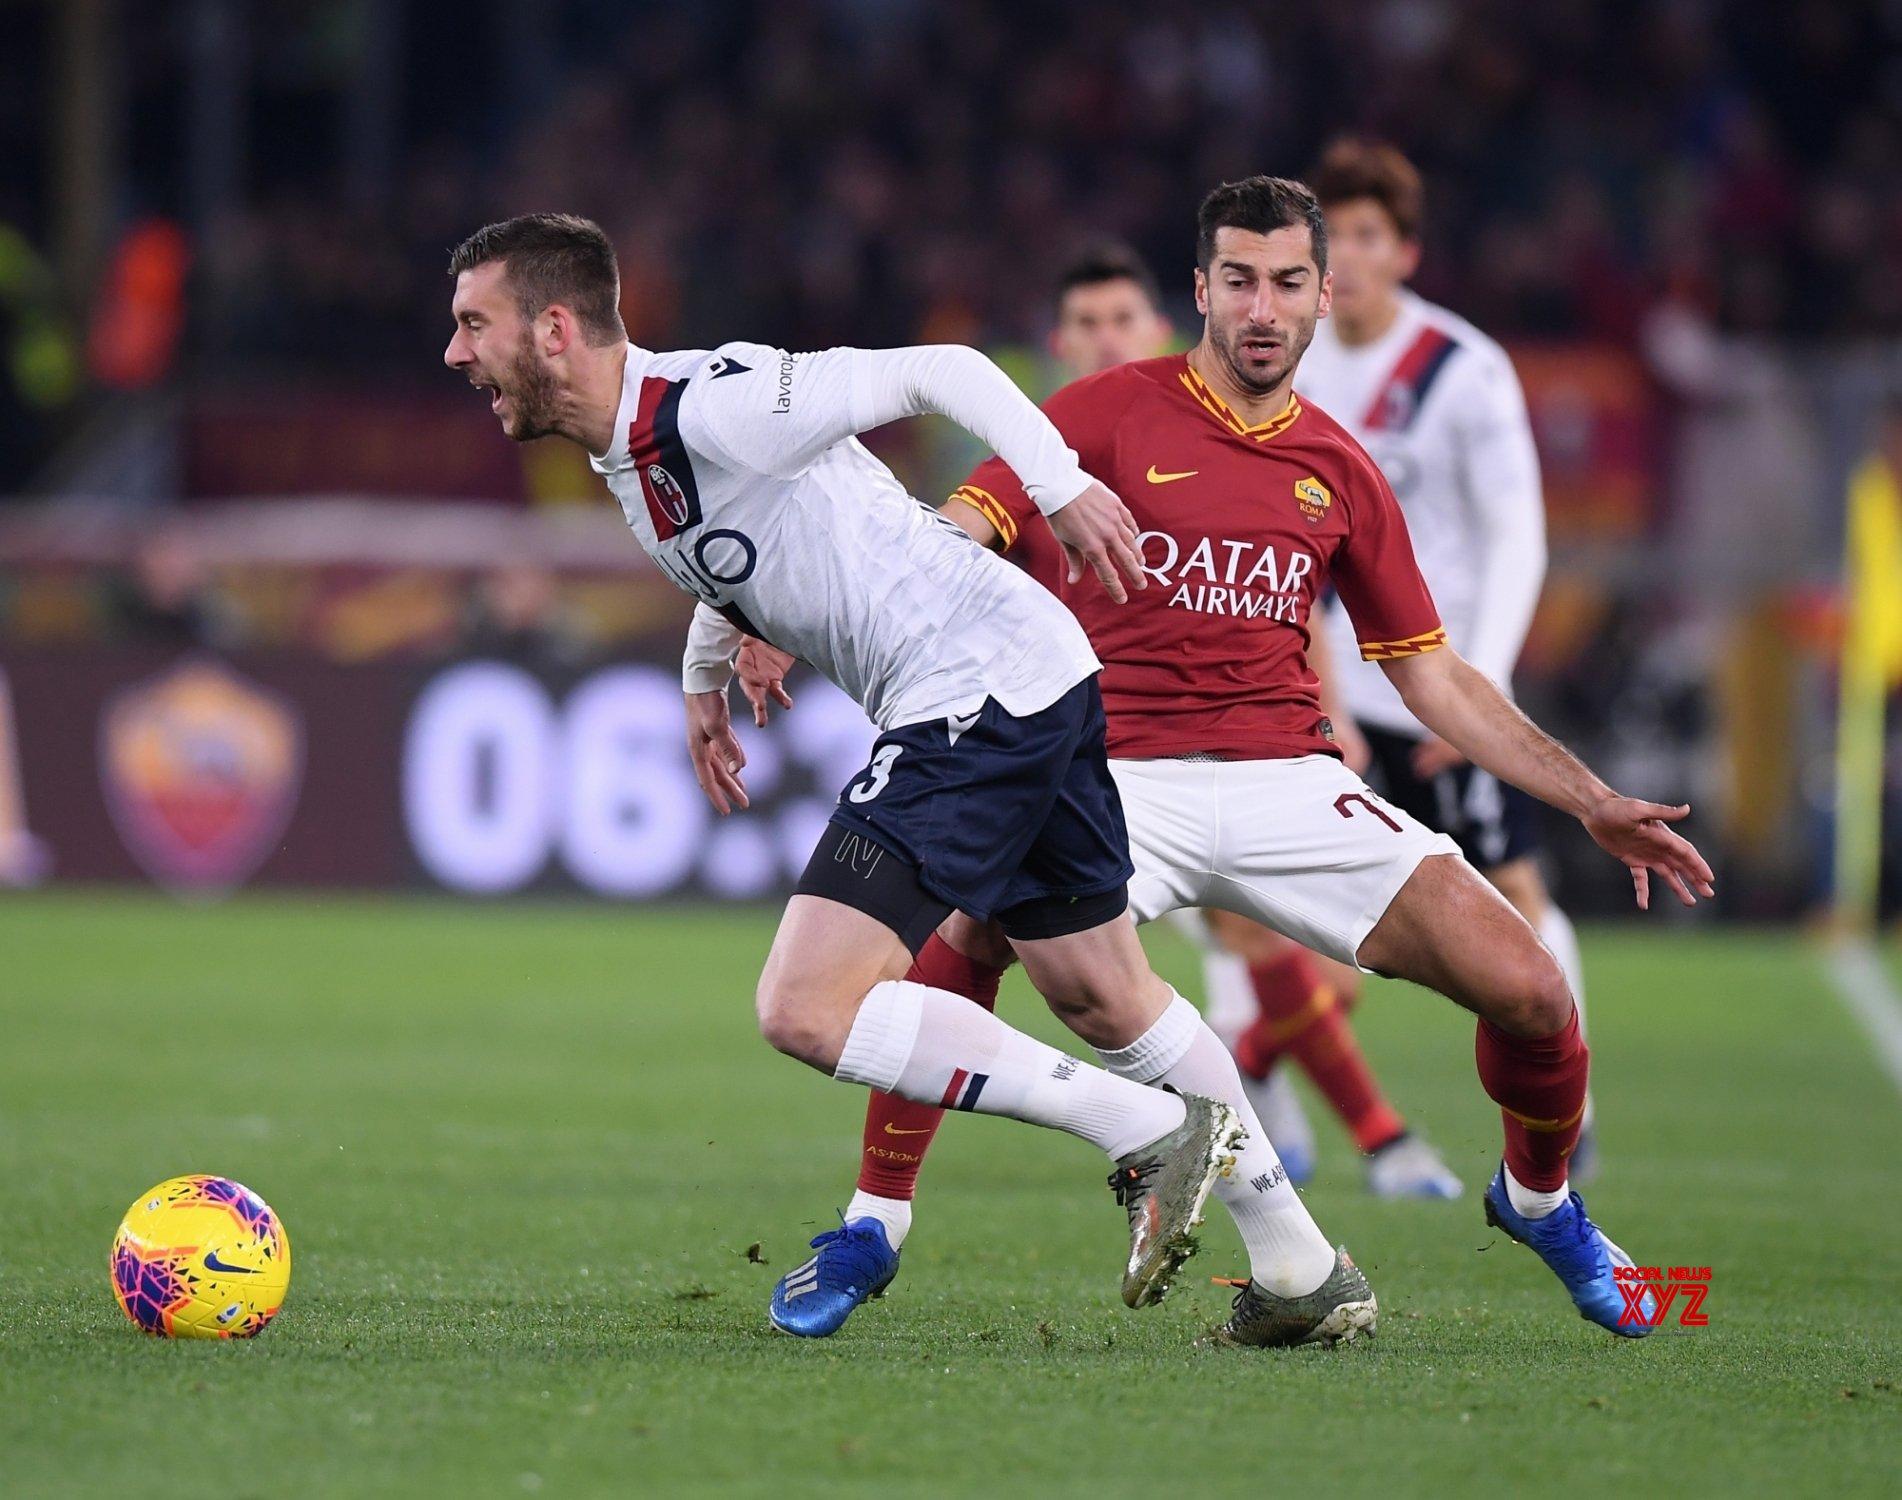 ITALY - ROME - FOOTBALL - SERIE A - ROMA VS BOLOGNA #Gallery